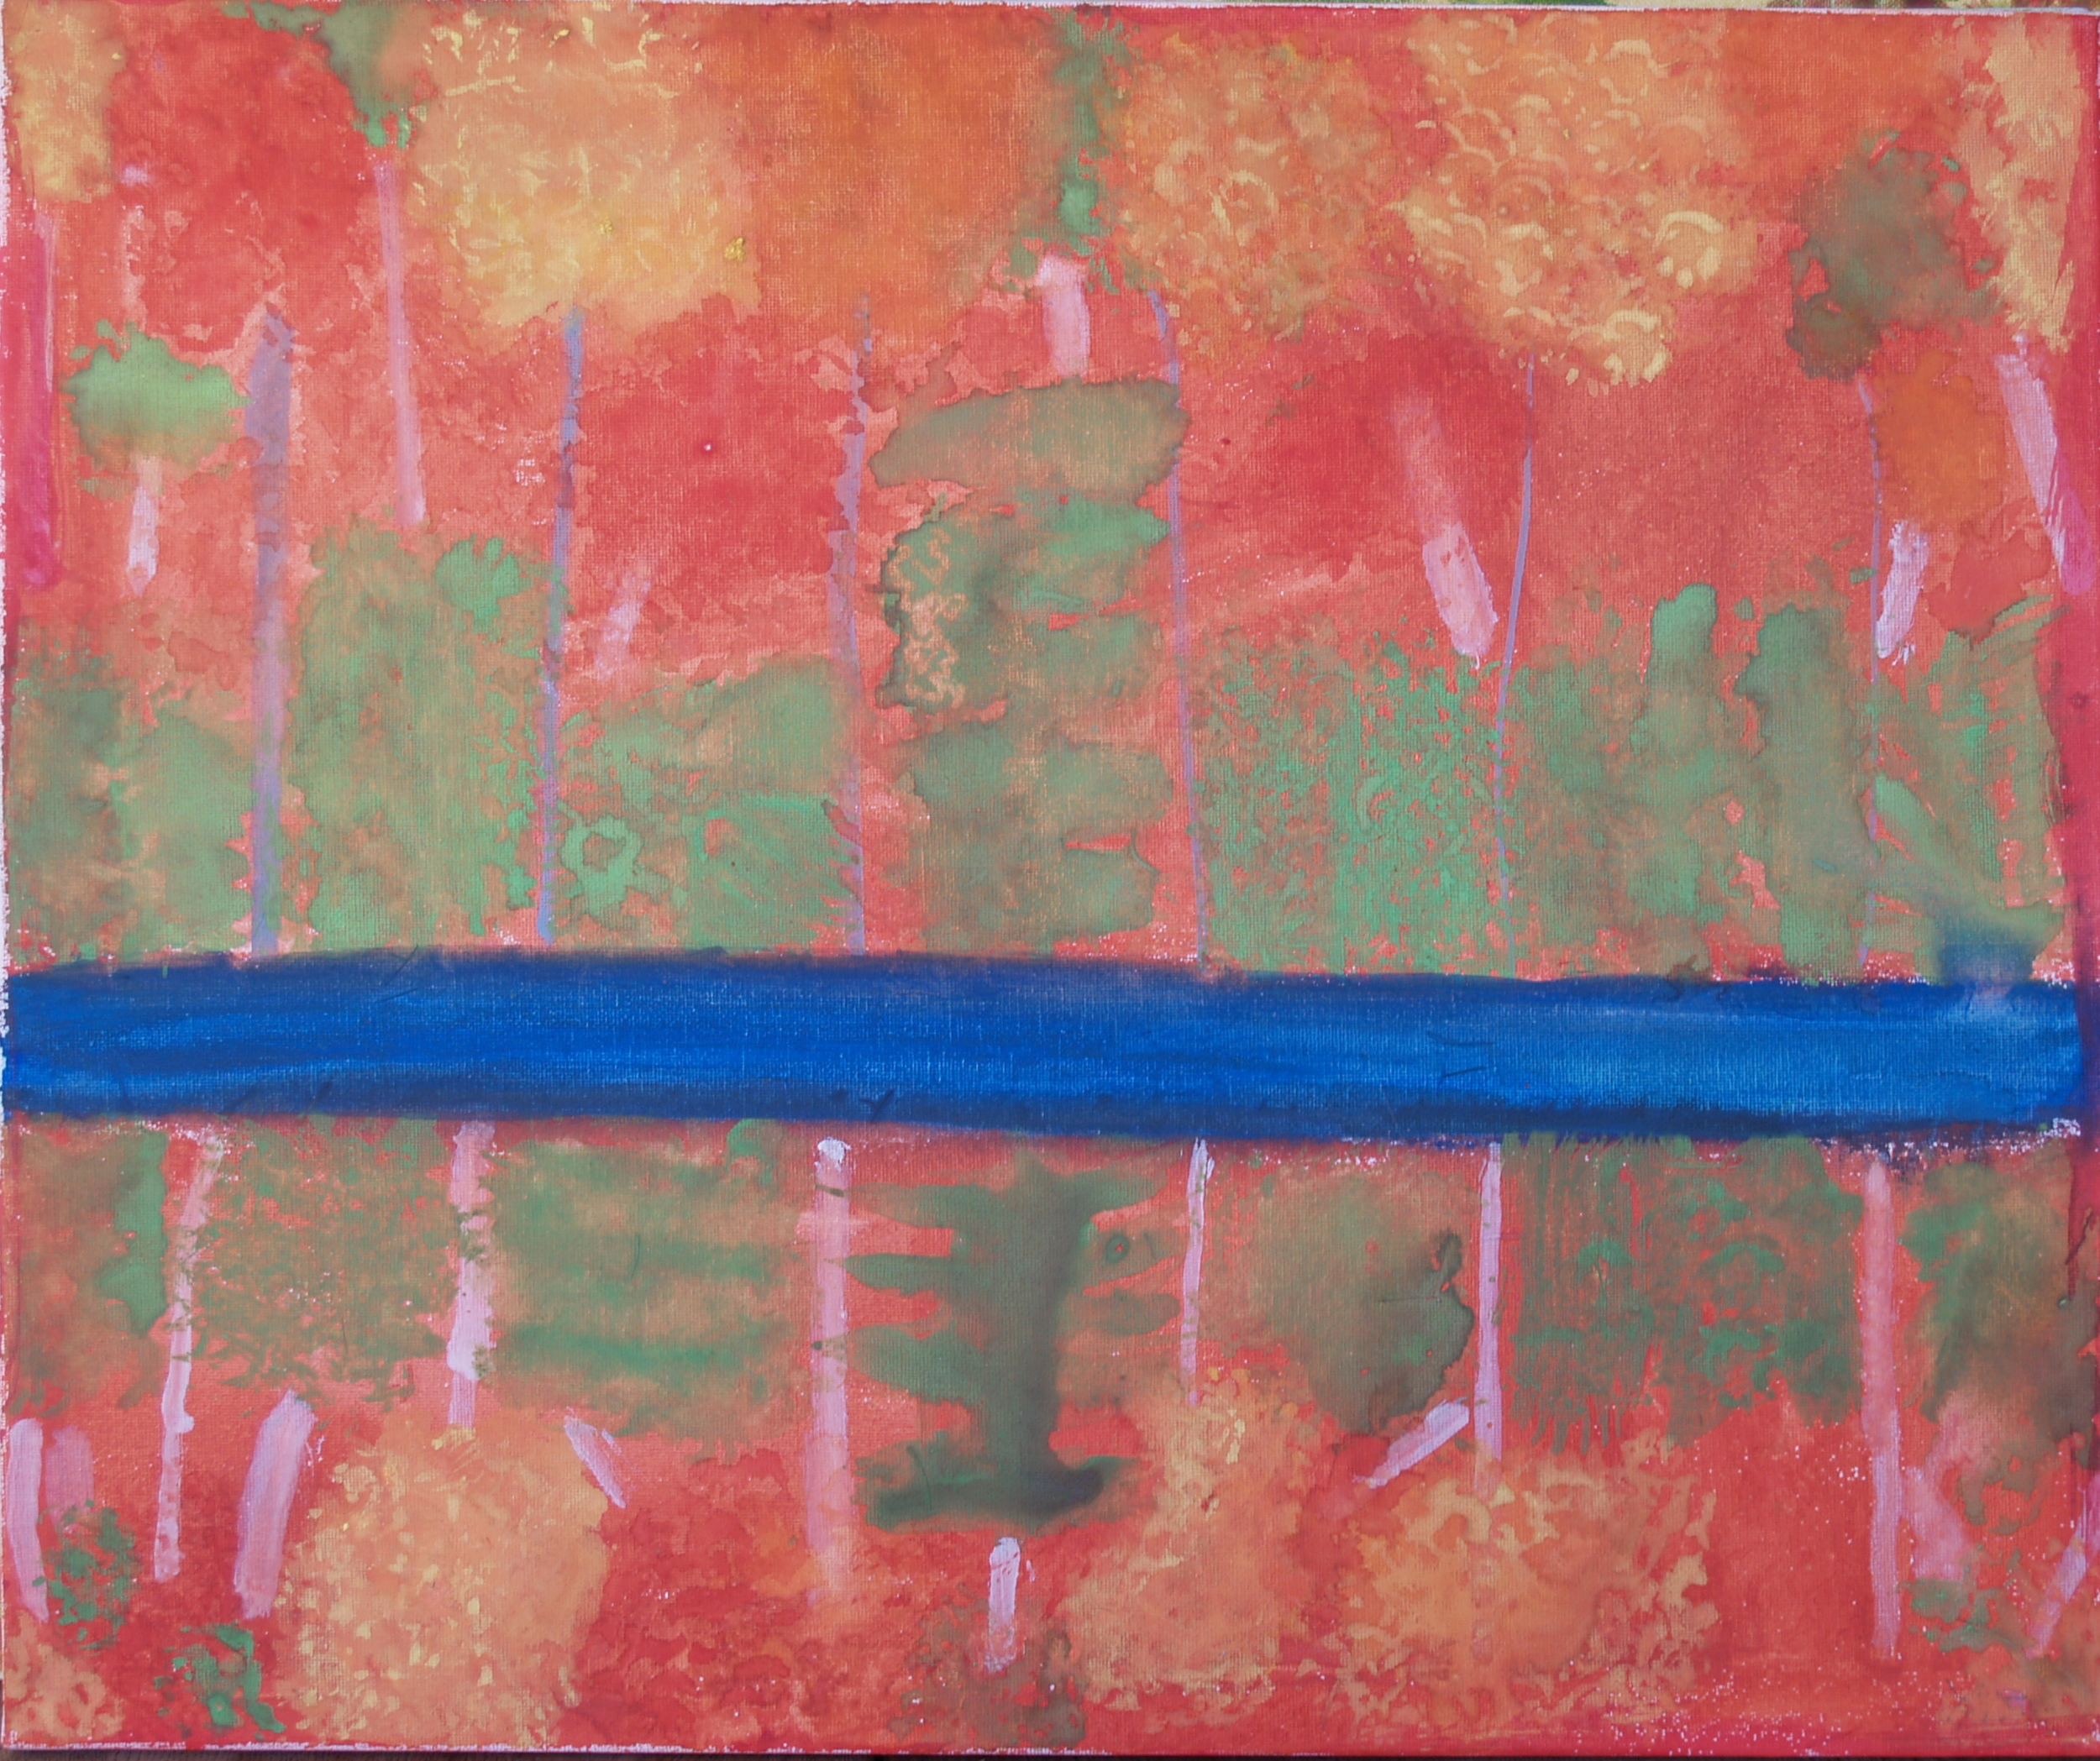 AUTUMN REDS, WATERCOLOUR ON CANVAS, 50 X 60CM